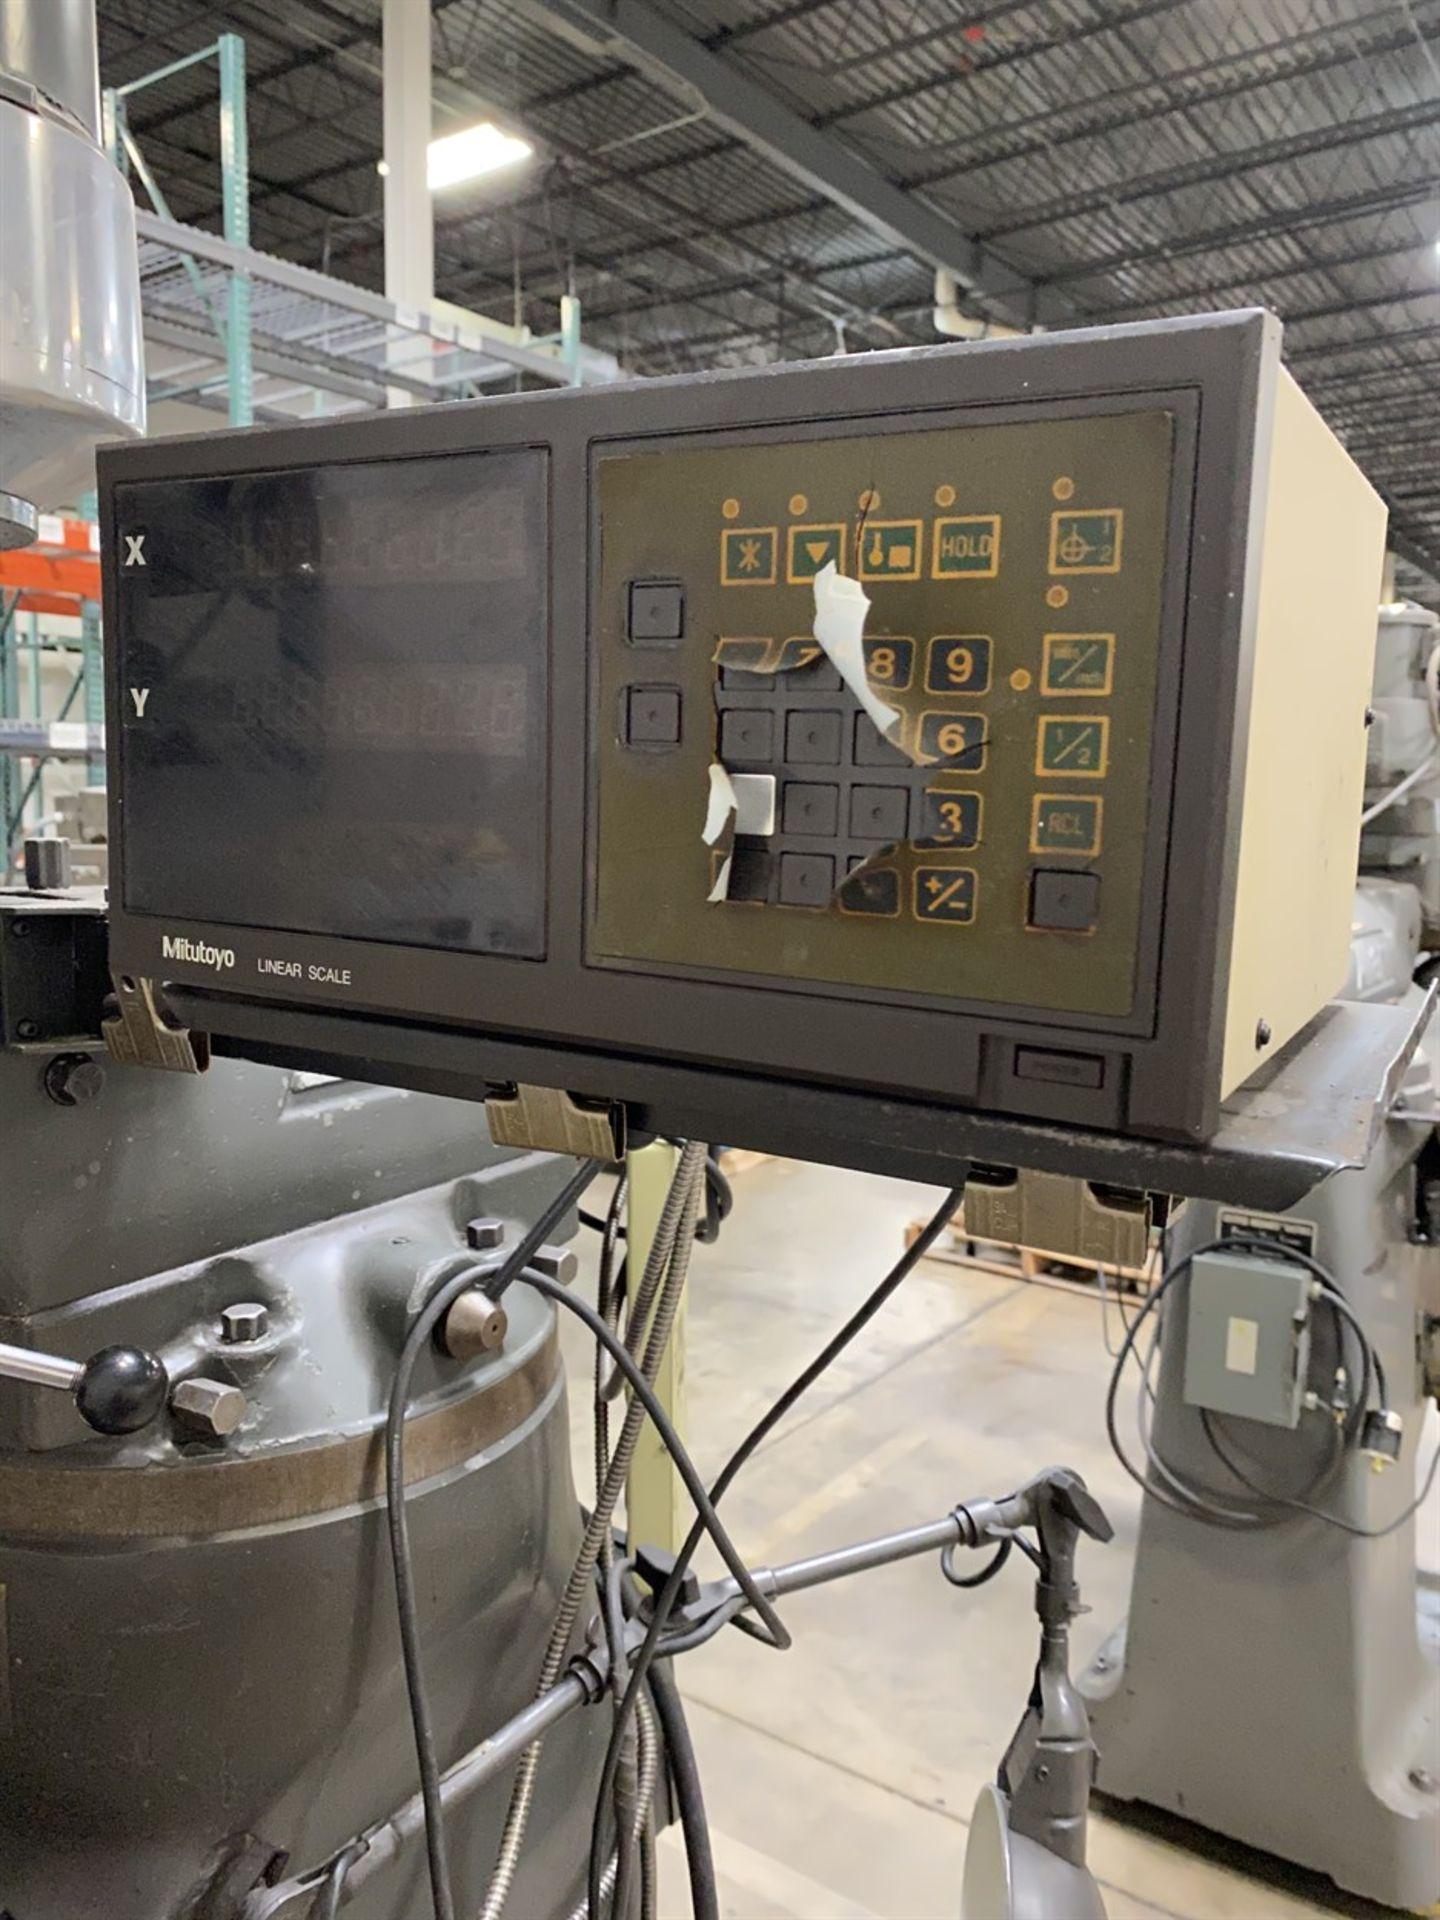 Lot 12 - BRIDGEPORT Series I Milling Machine, s/n 98609, Mitutoyo DRO